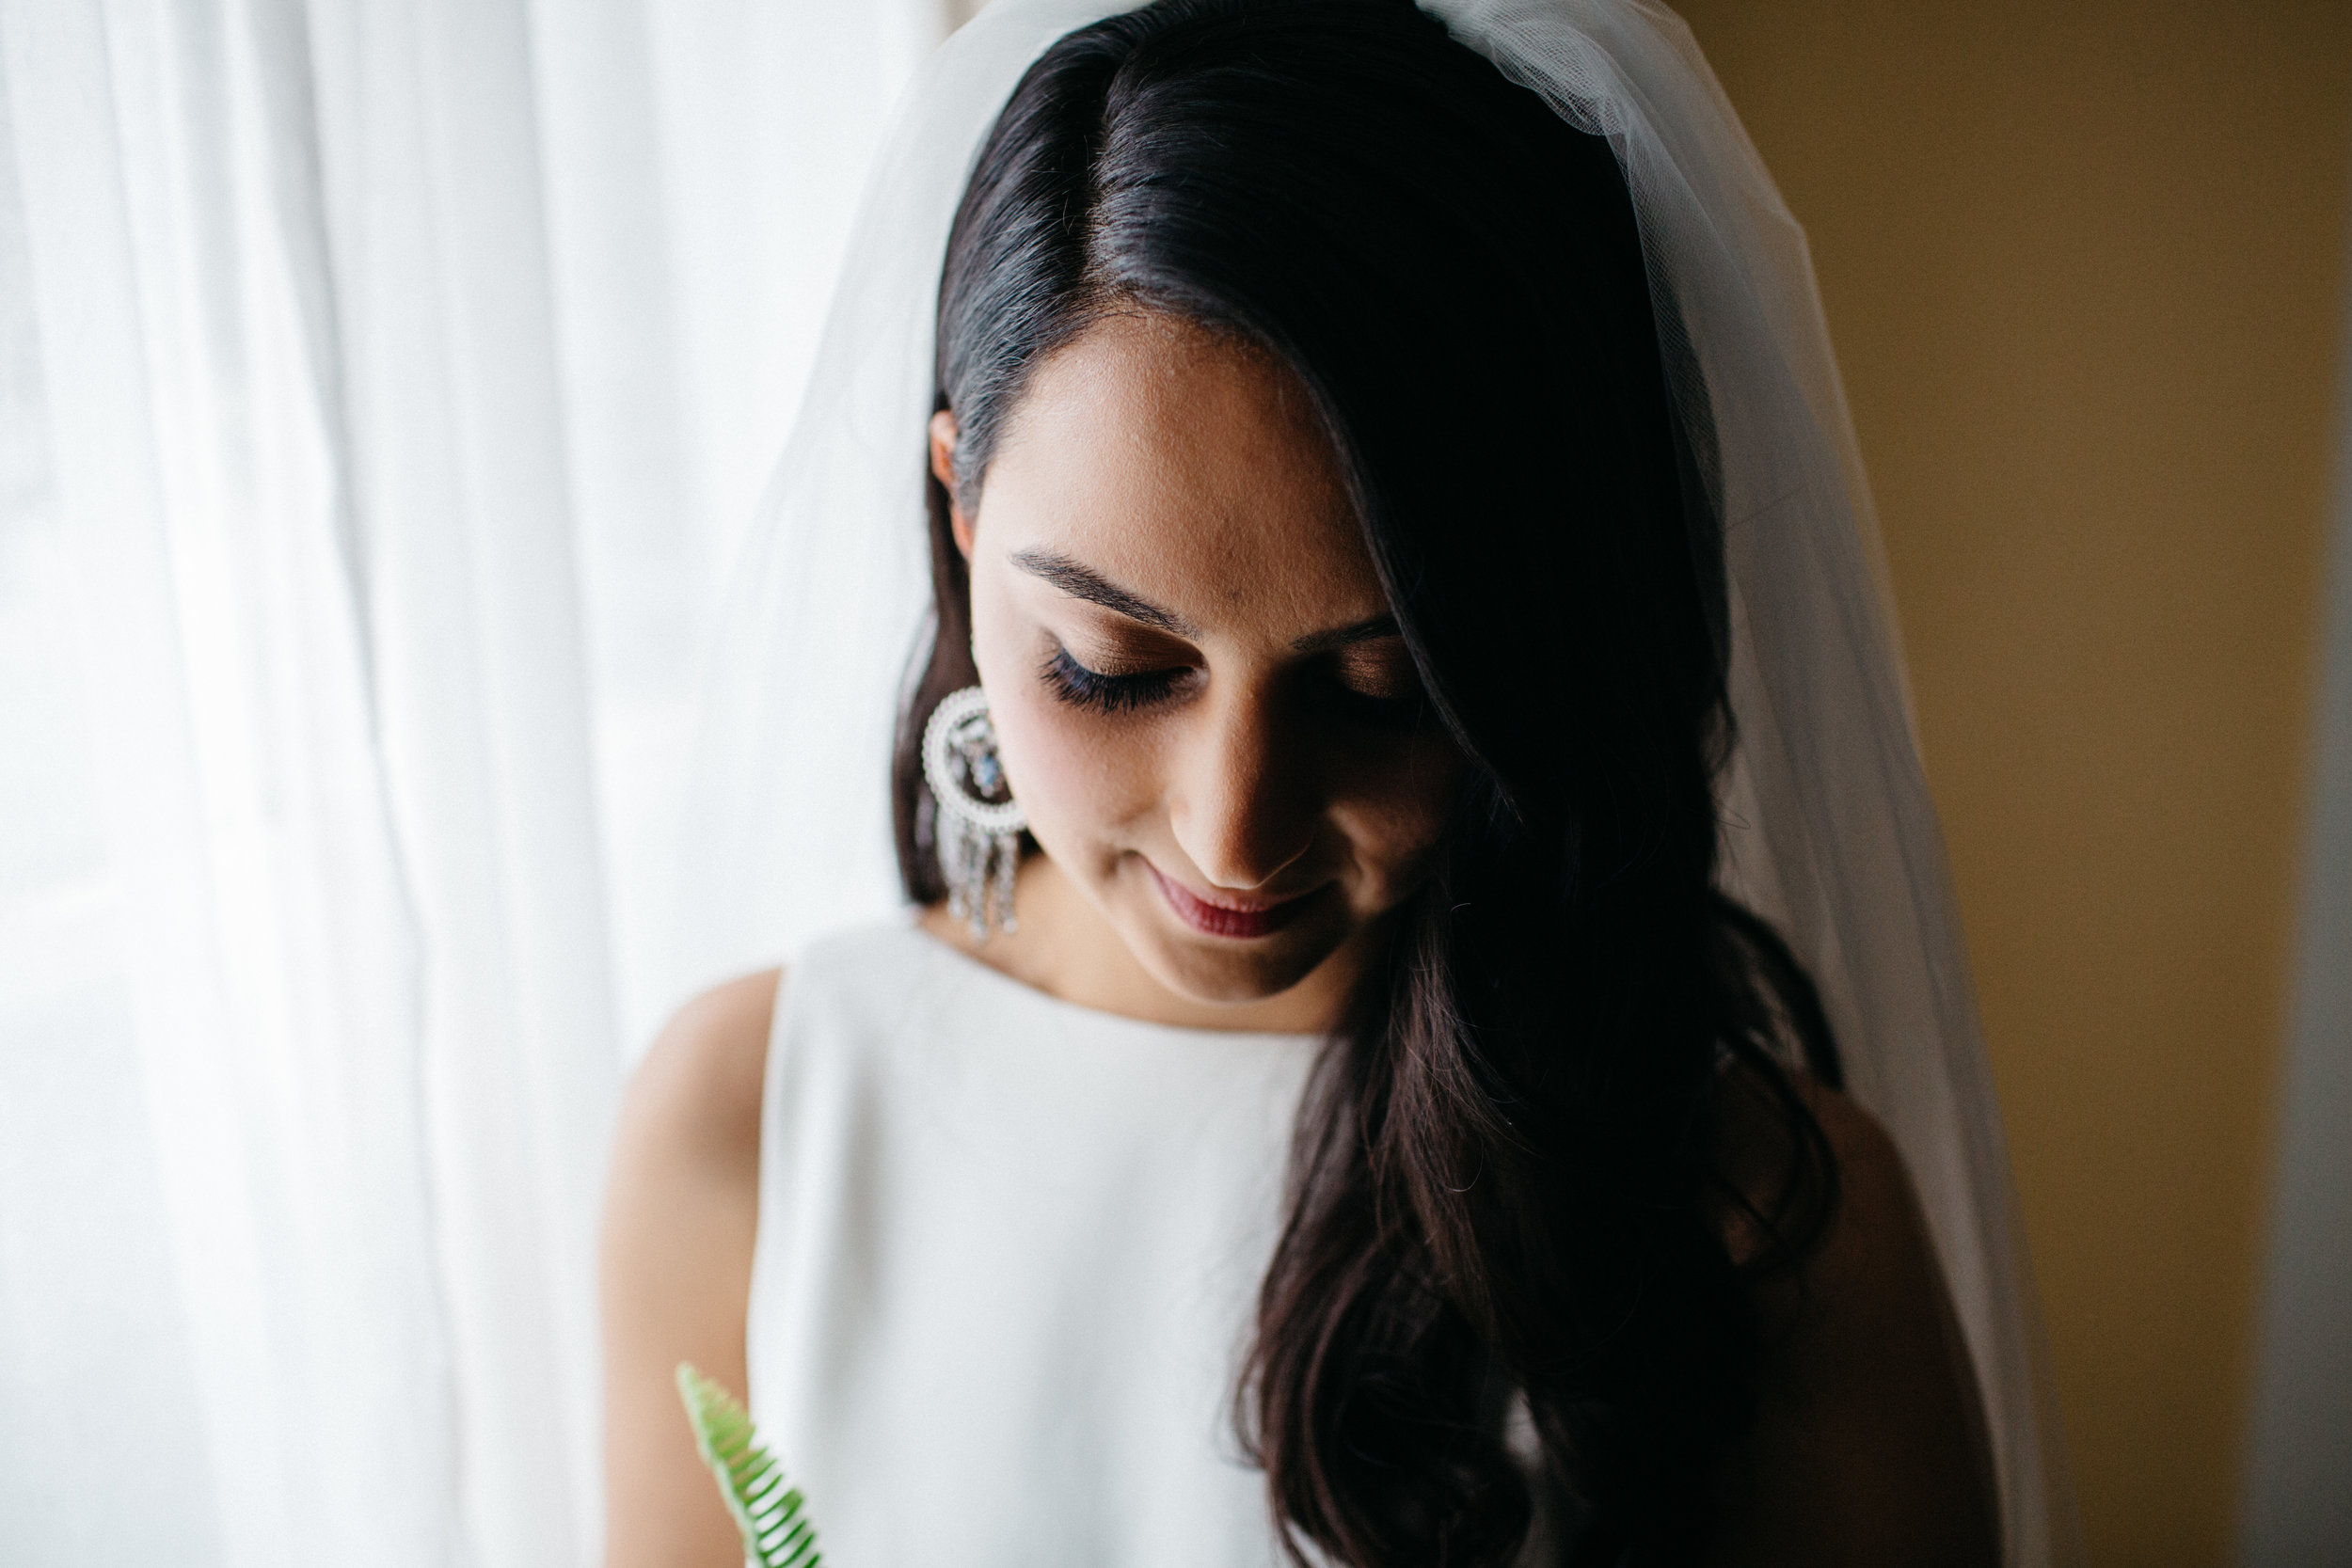 sweet_and_crafty_jocelyn_domingo_wedding_portfolio_021.jpg